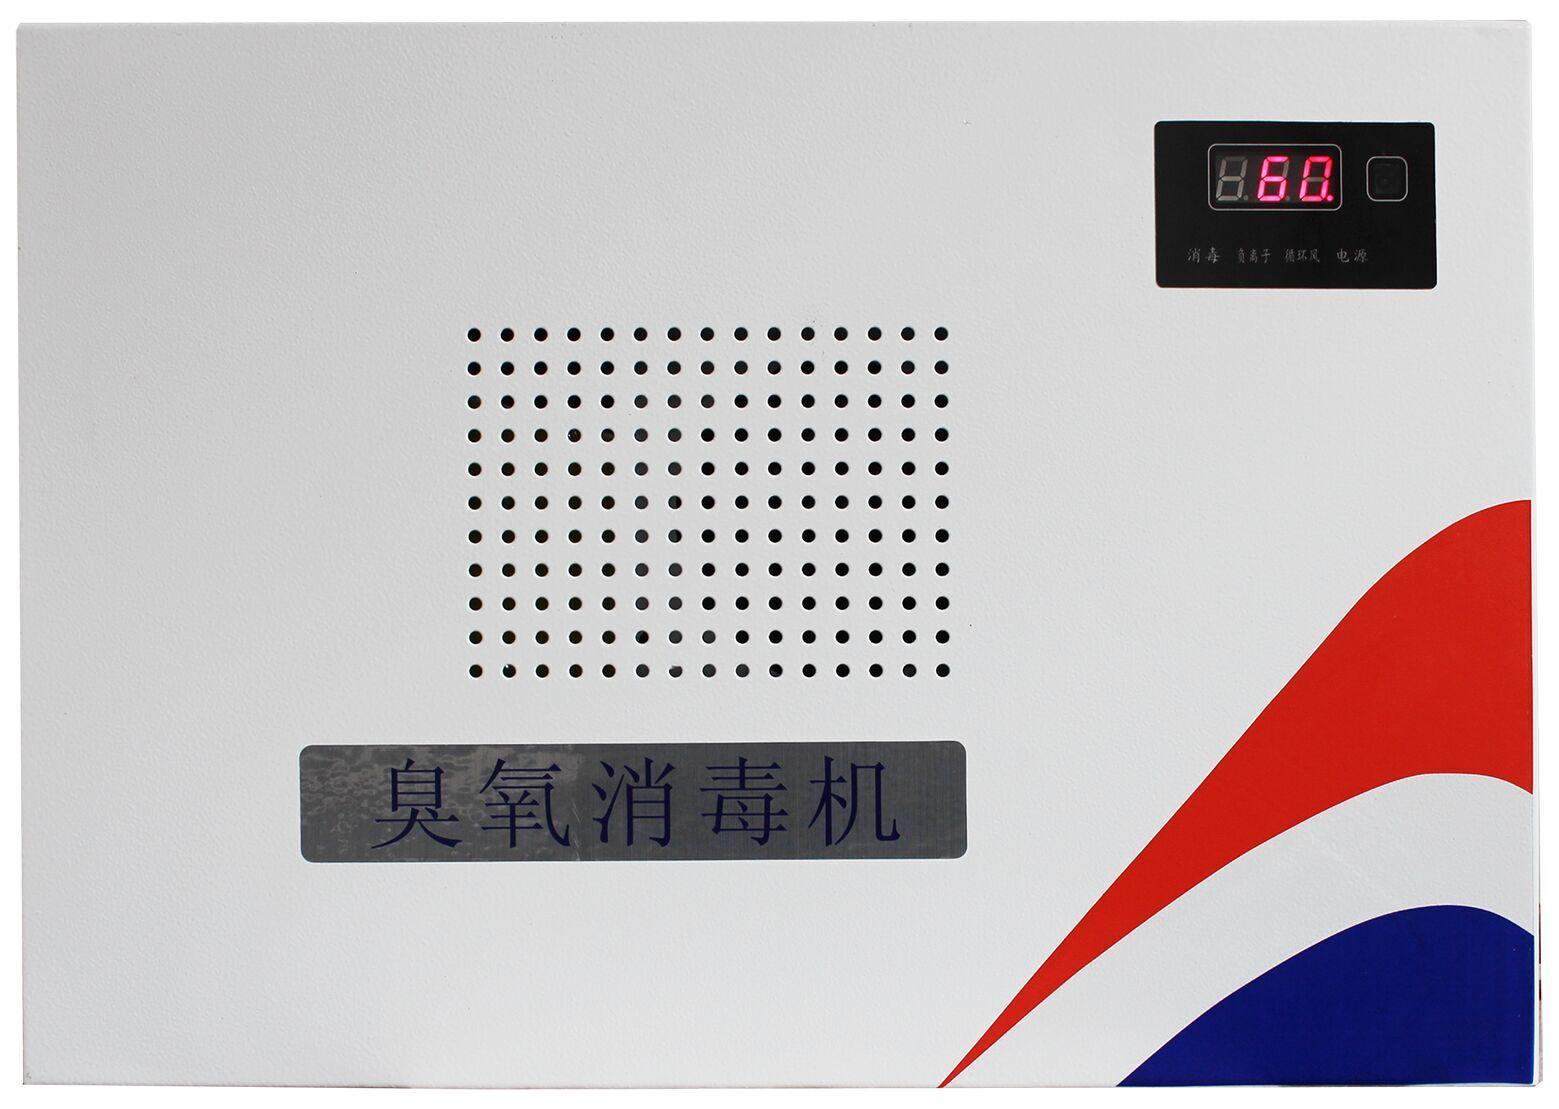 SL-LY系列壁挂移动两用式库房消毒机